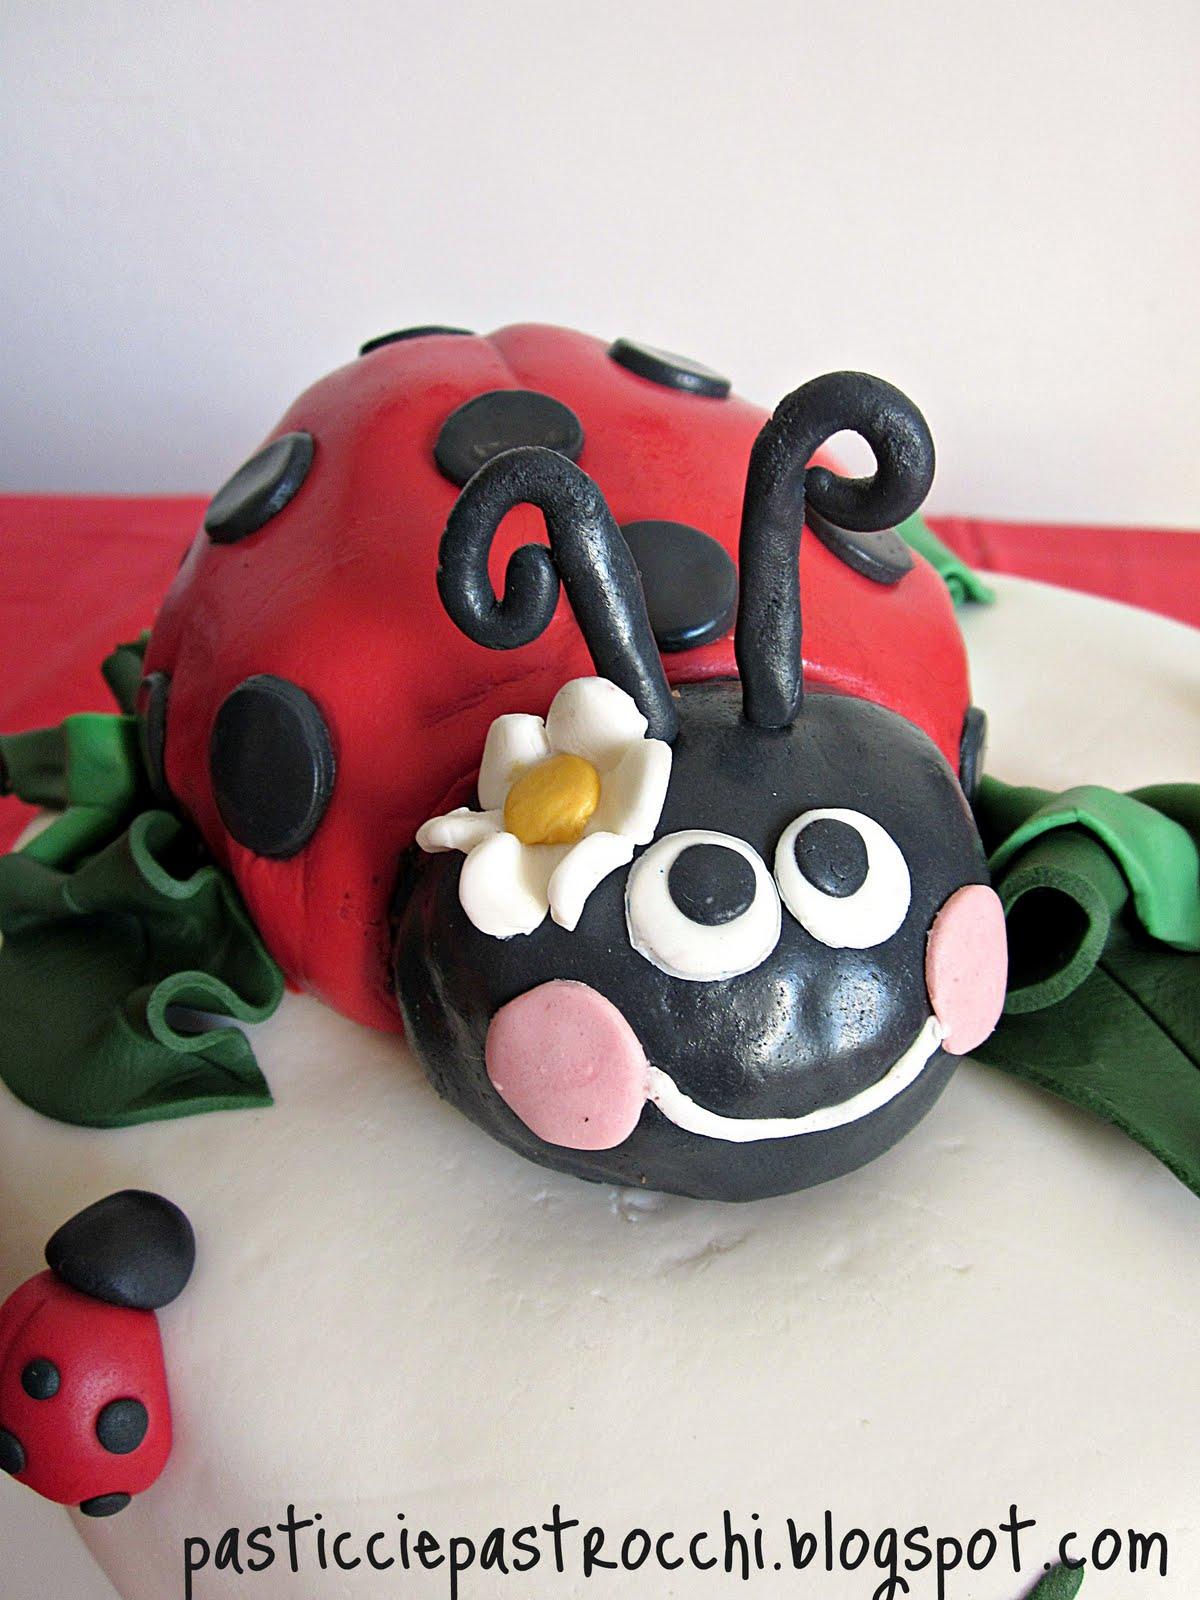 Pasticci pastrocchi my little ladybug